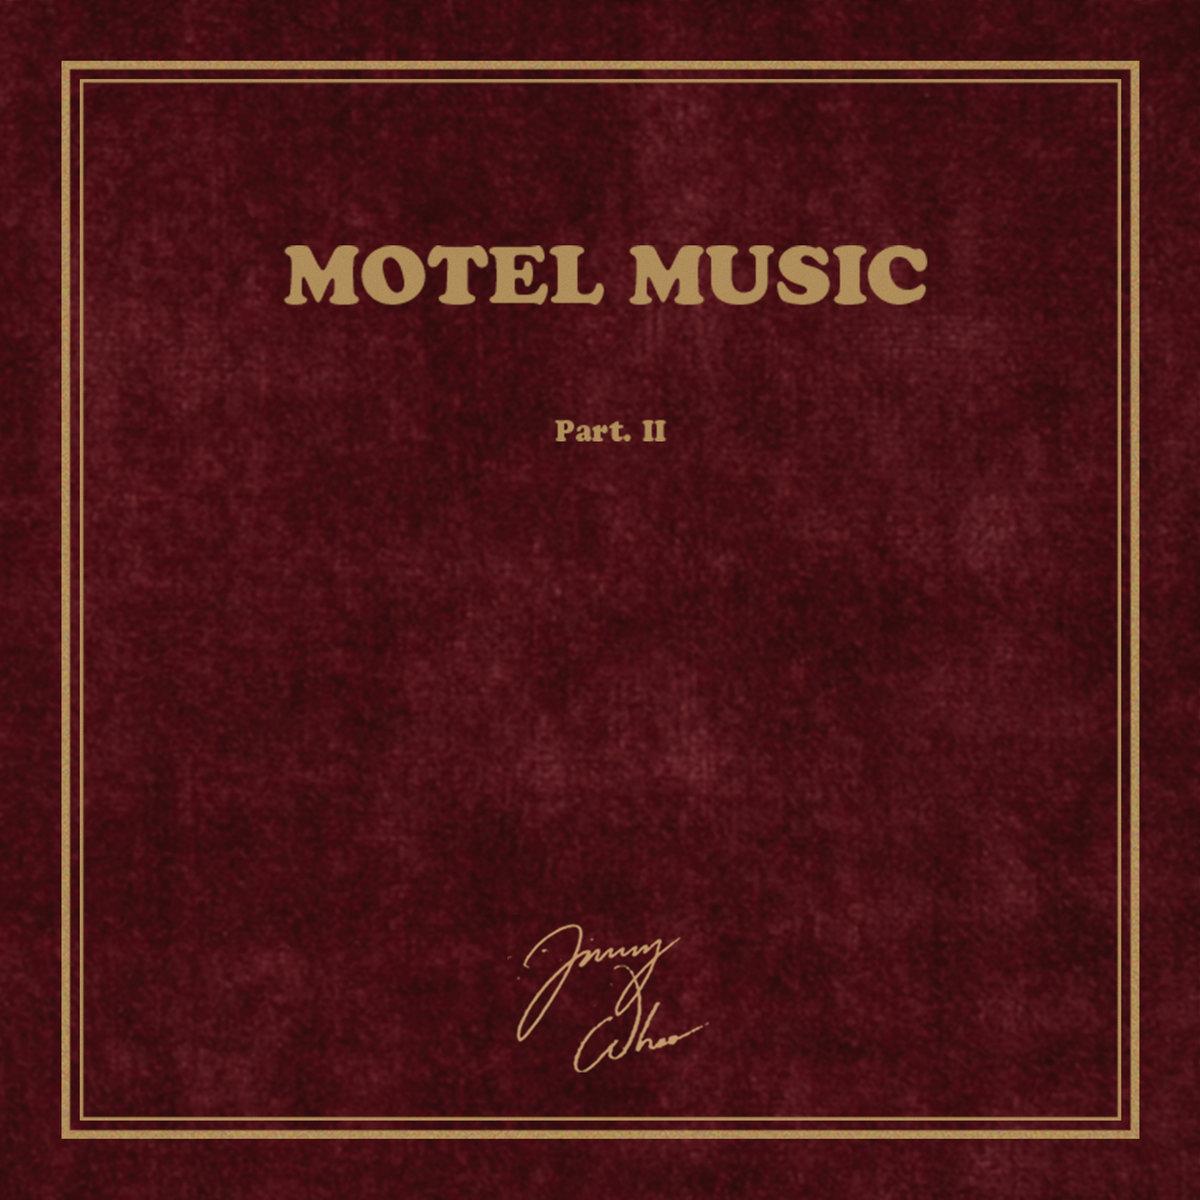 Jimmy Whoo – «Motel Music» Part.II (2017)